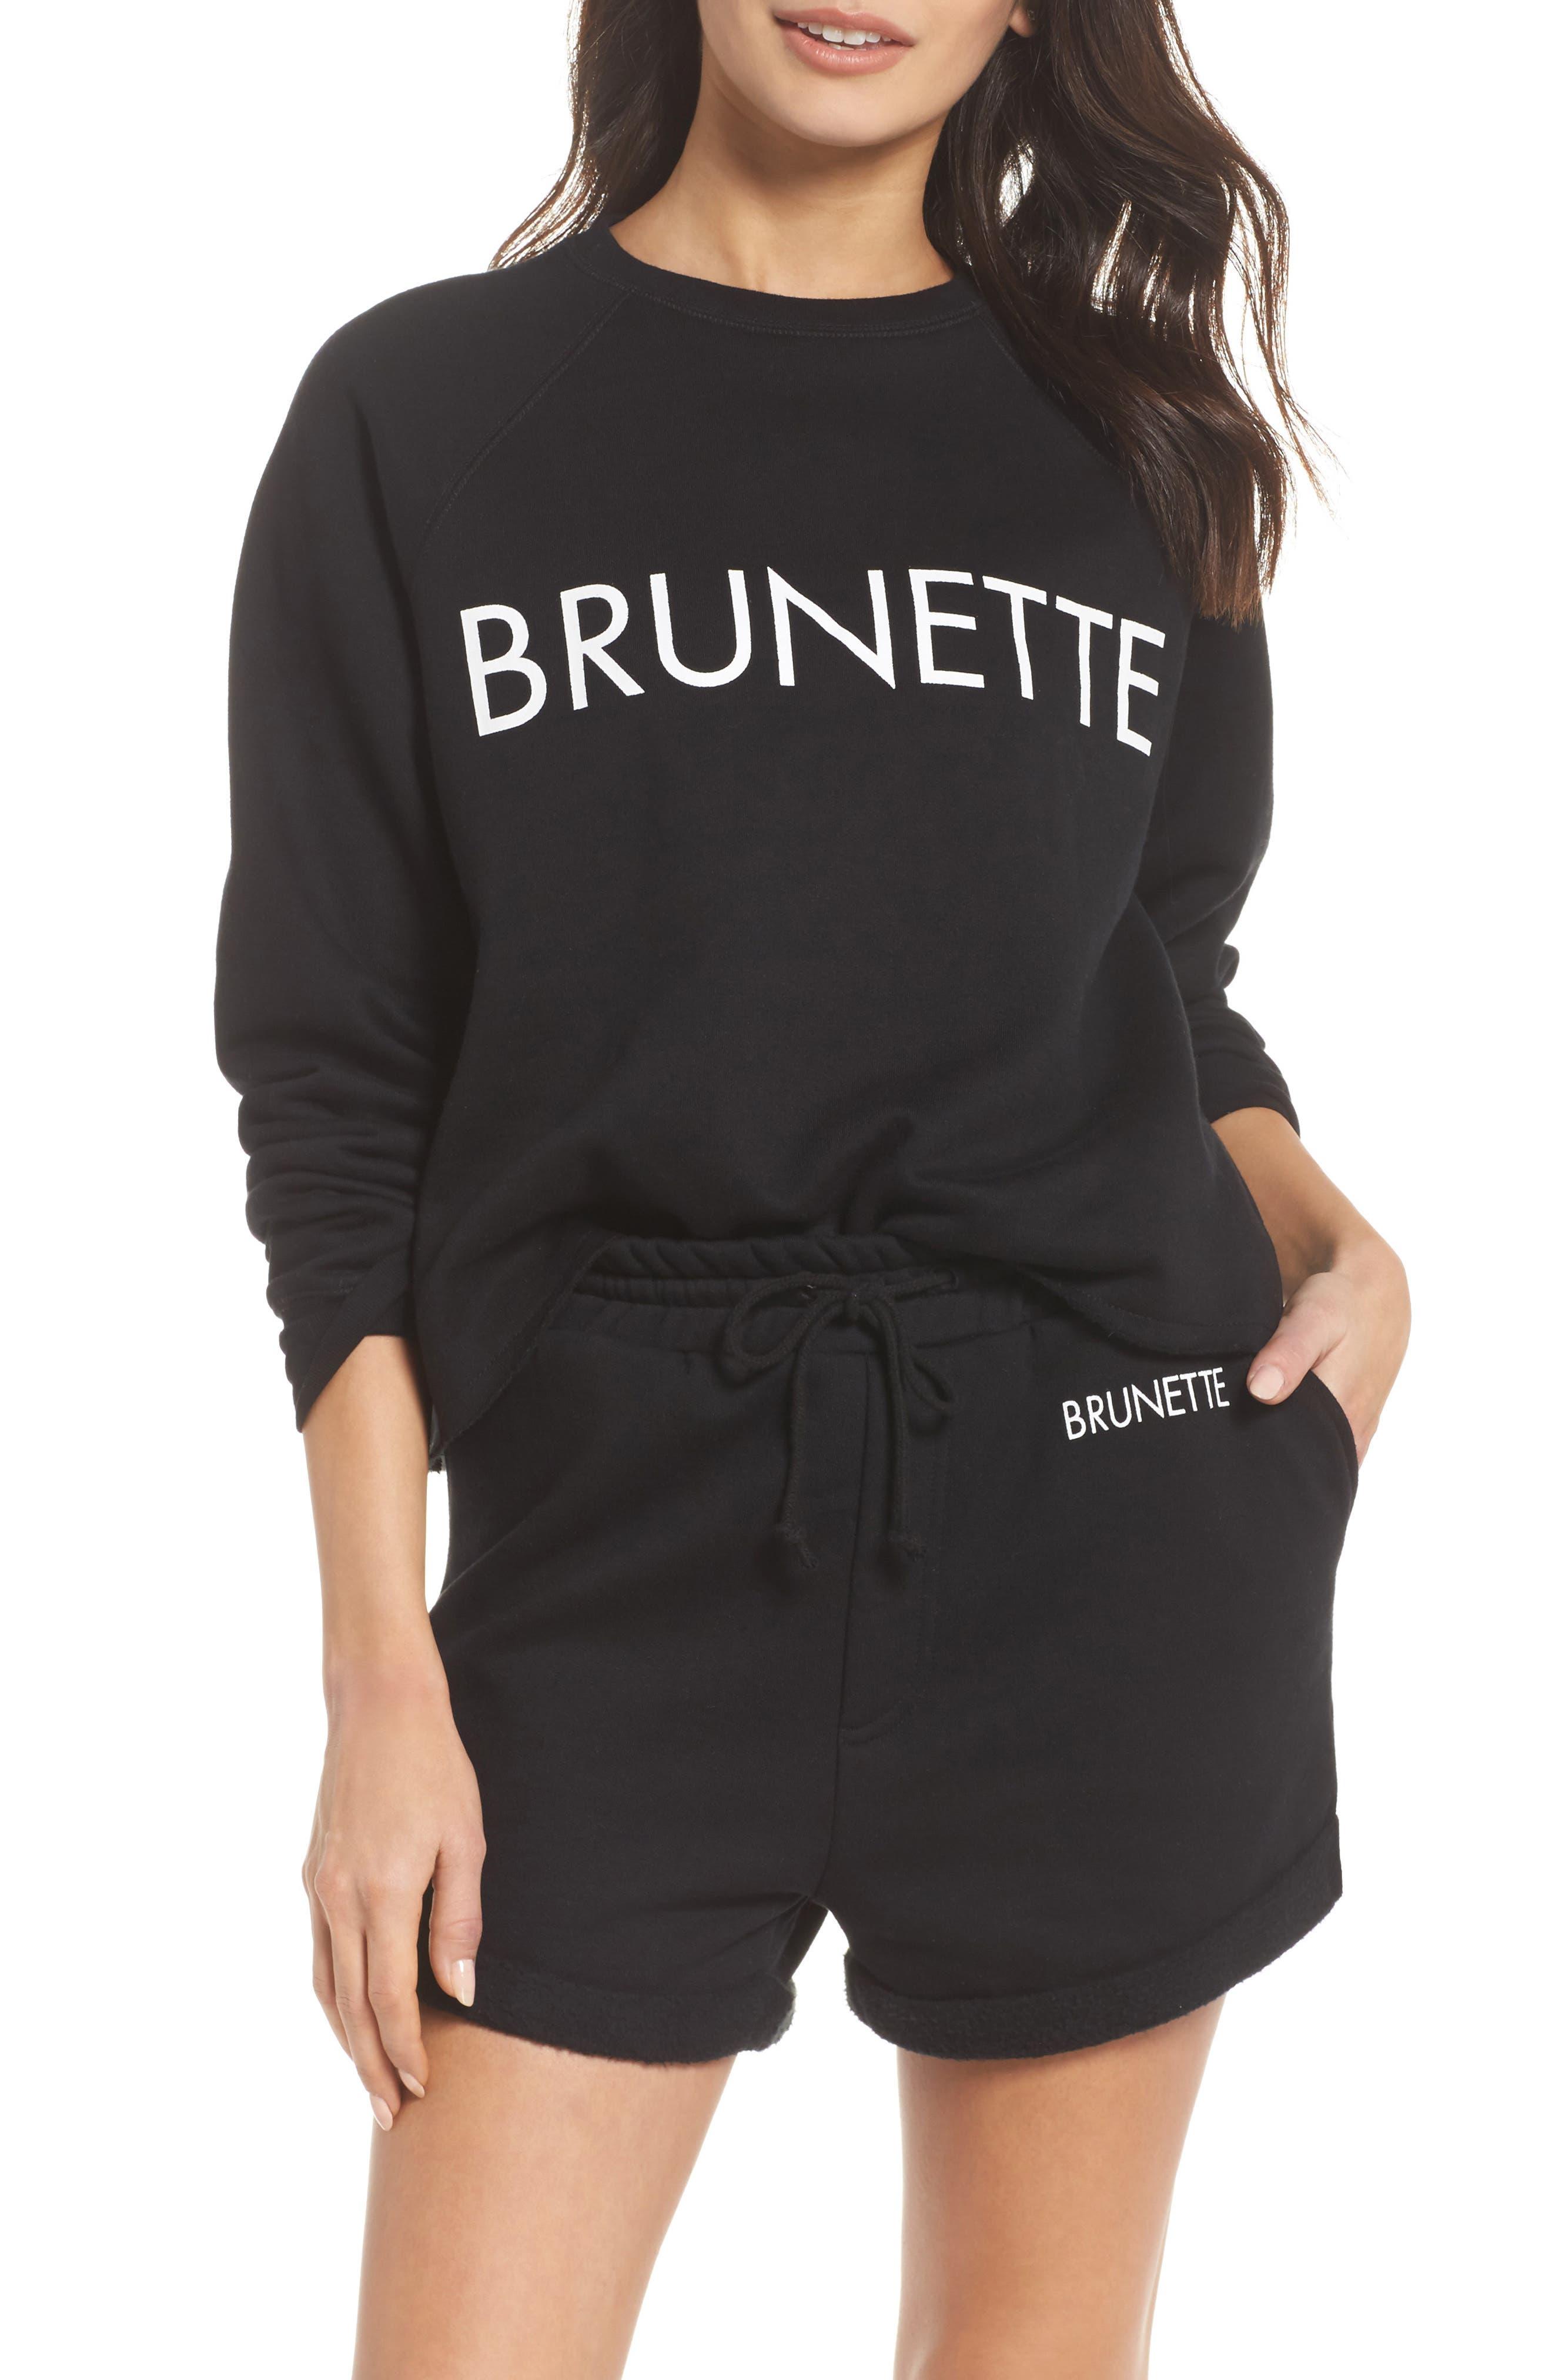 Brunette Shorts,                             Alternate thumbnail 4, color,                             Black